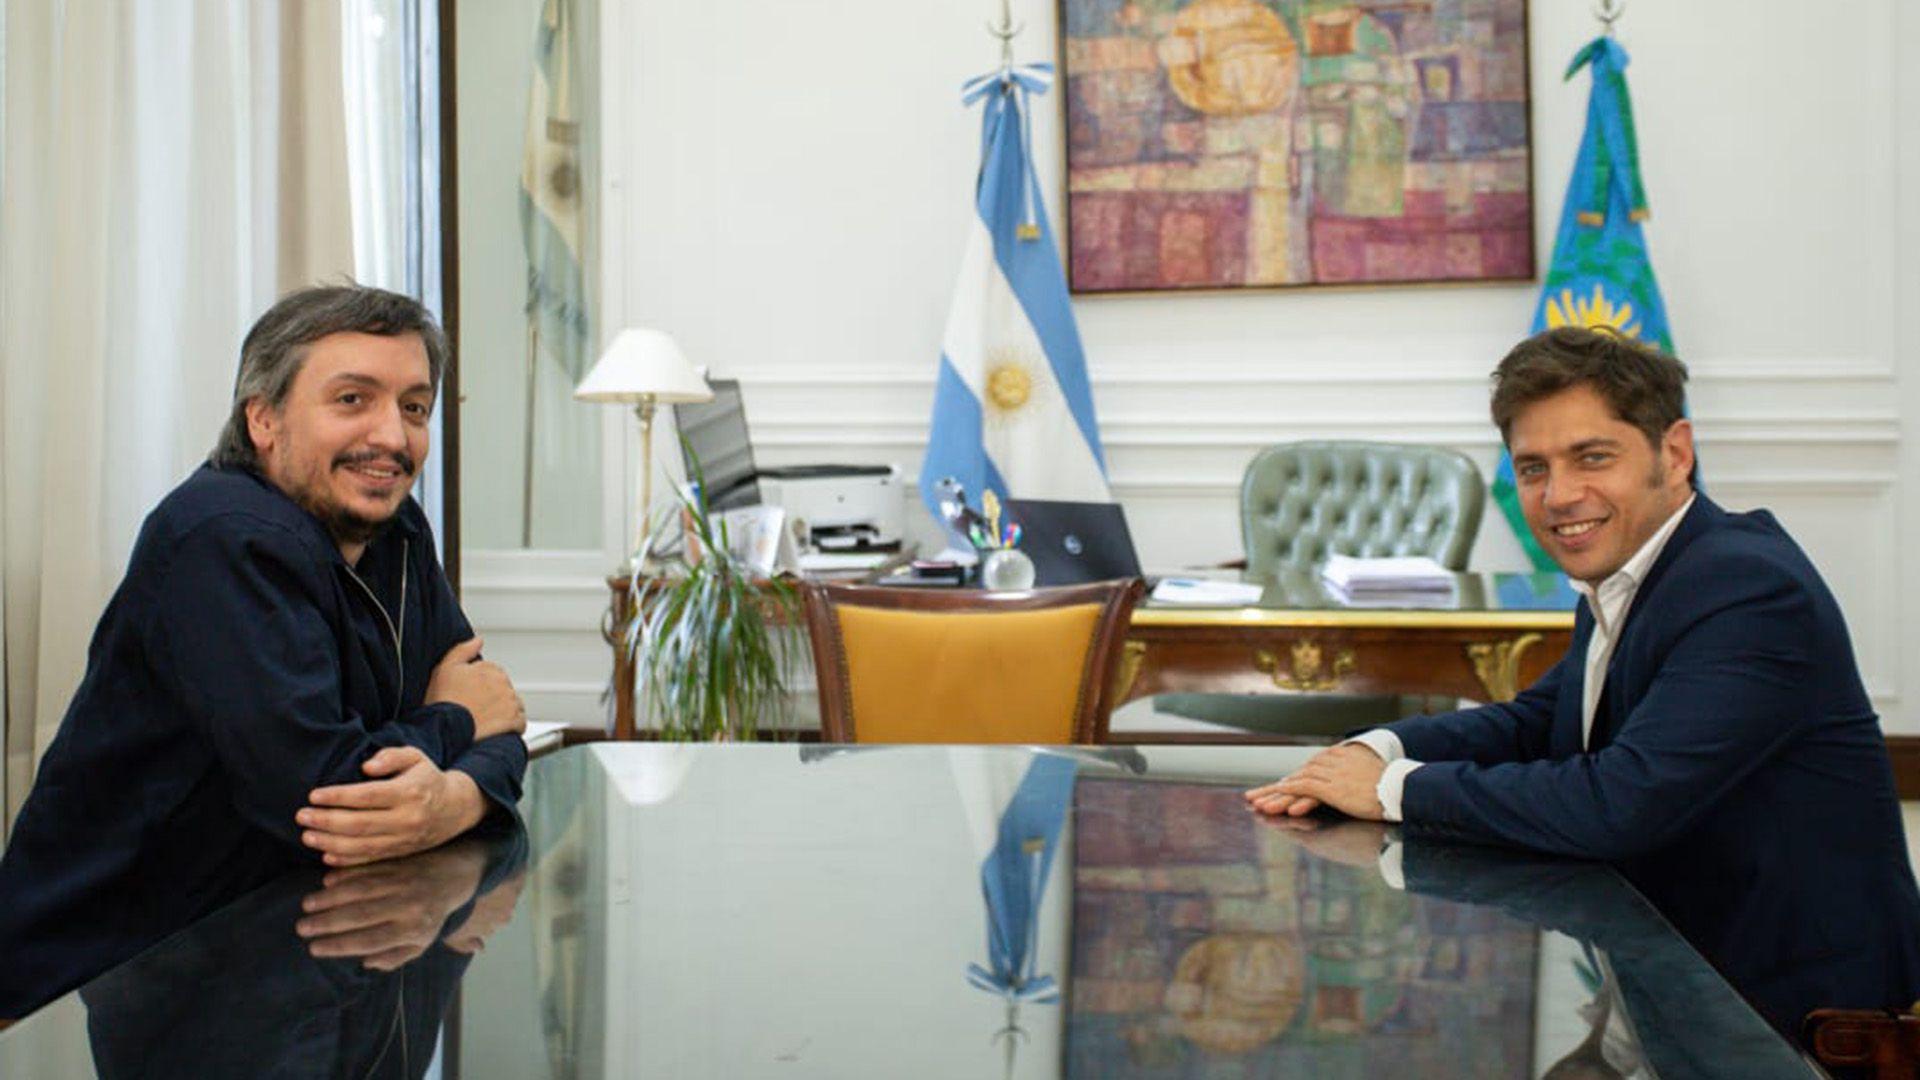 Máximo Kirchner y Axel Kicillof, gobernador de la Provincia de Buenos Aire